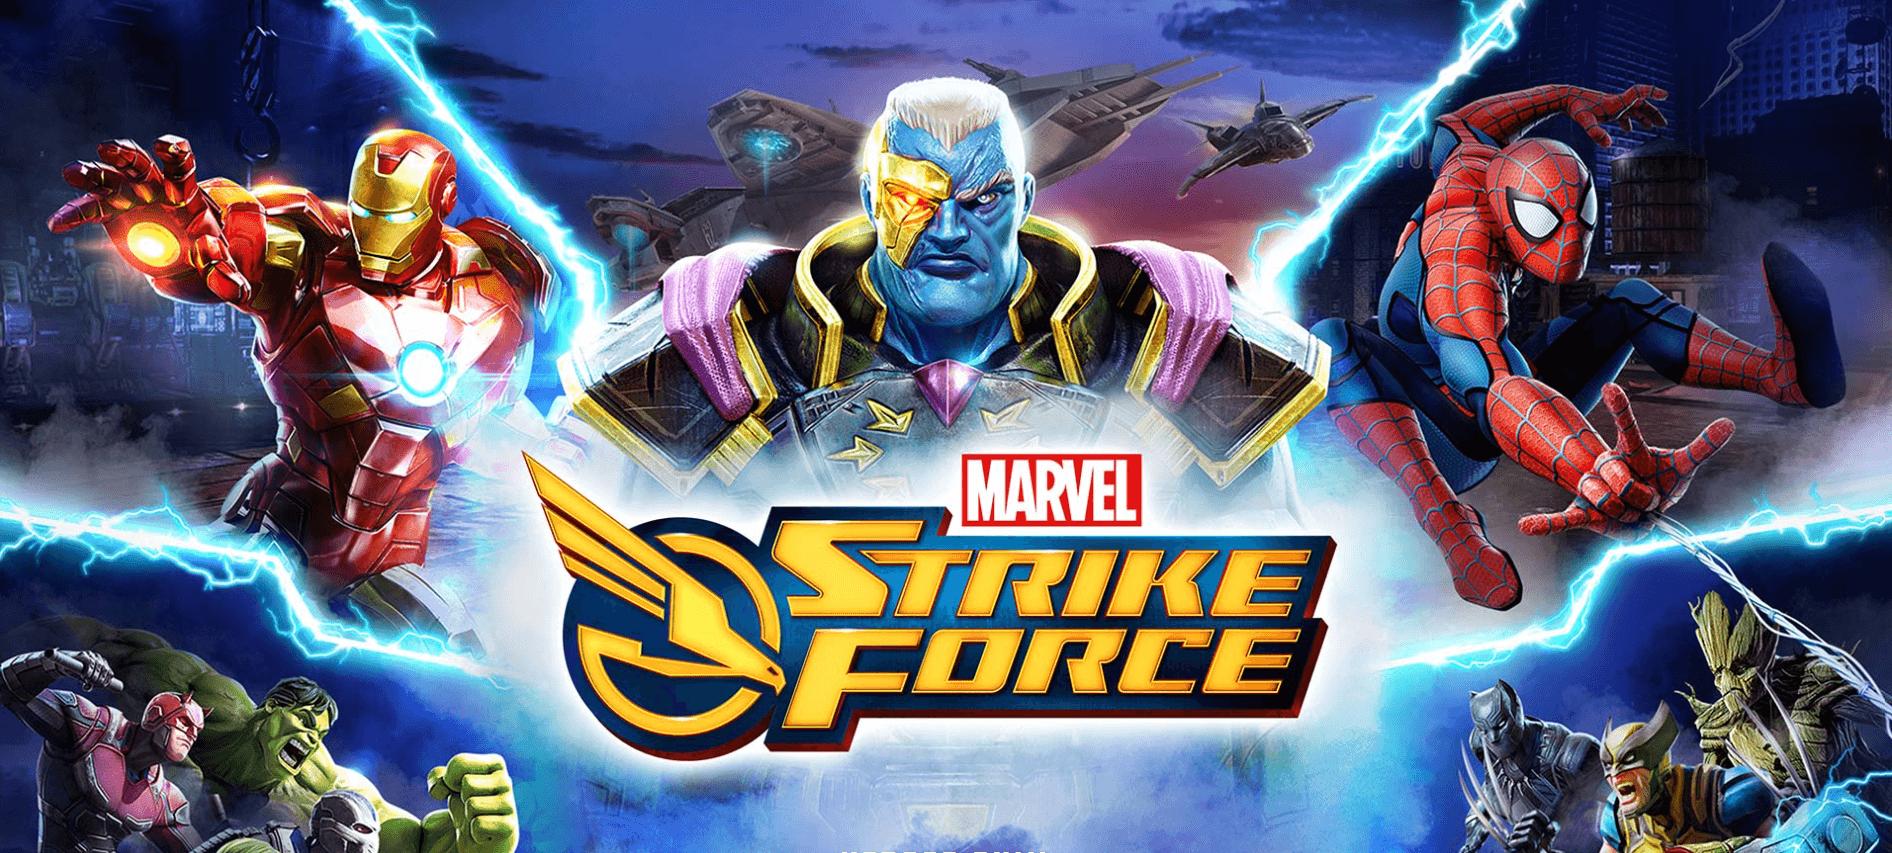 Marvel Strike Force 5.7: The New Alliance War Update